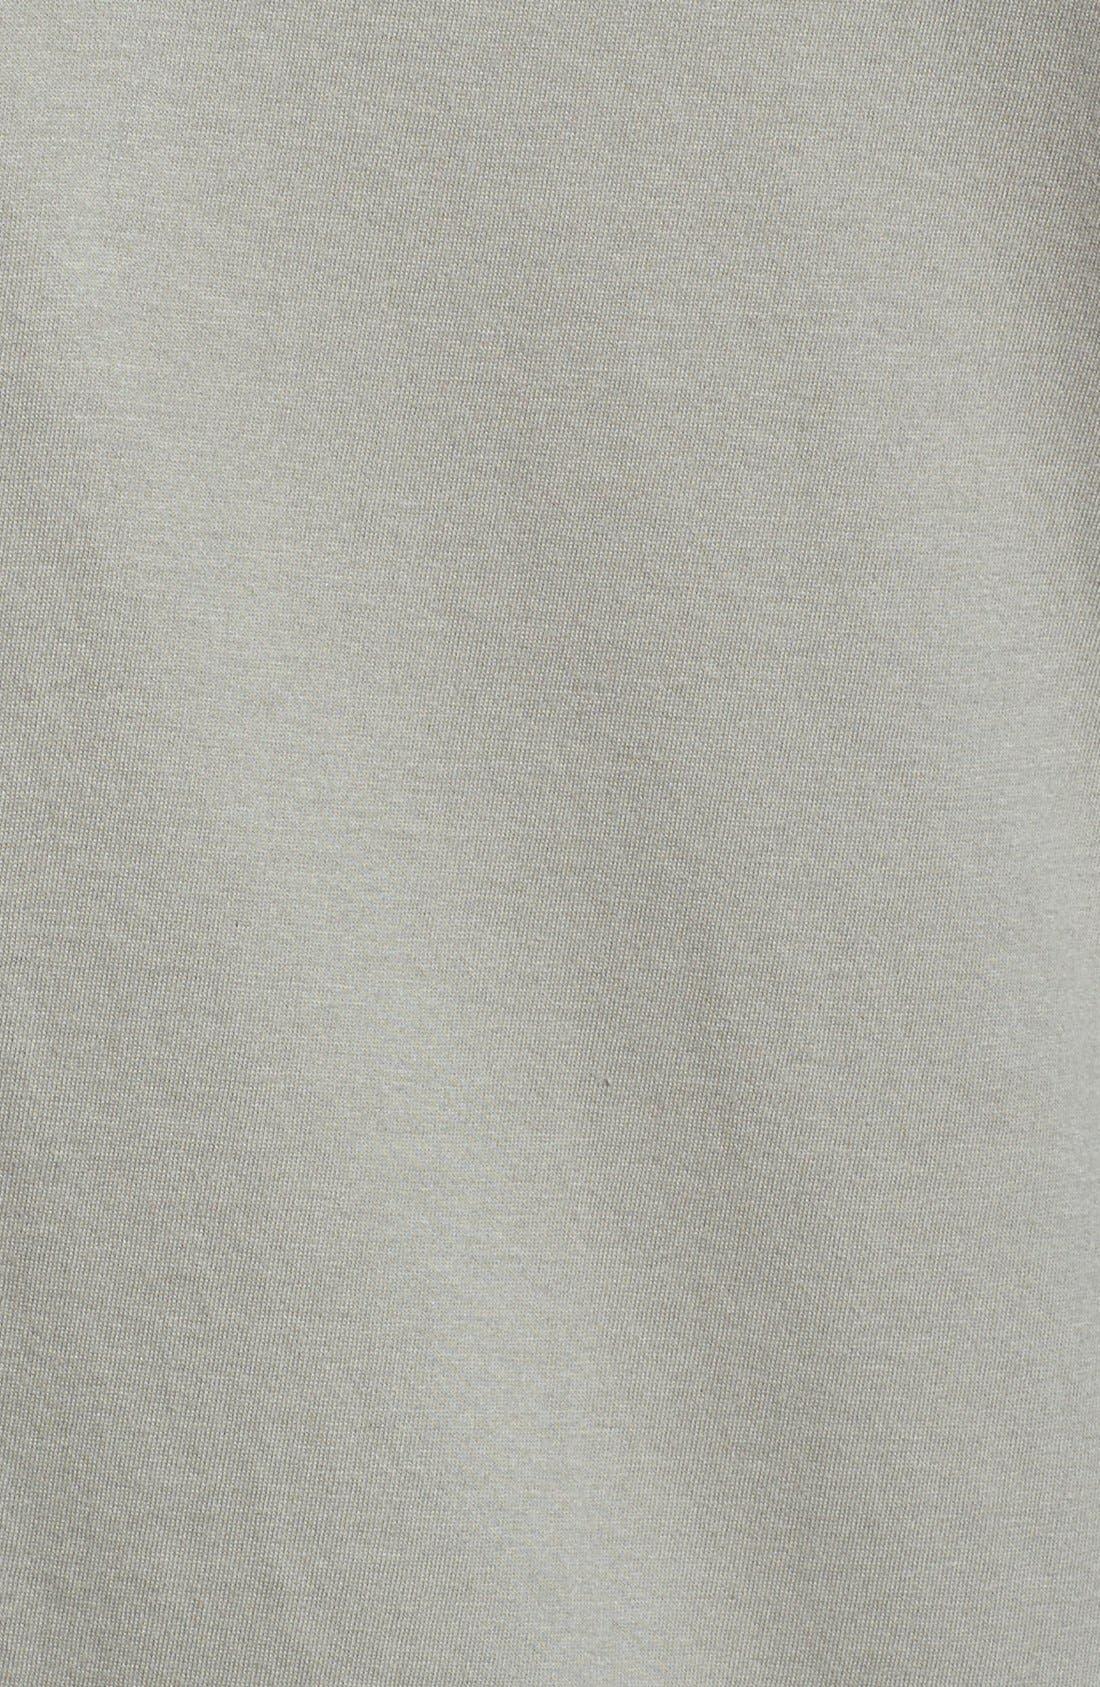 'St. Louis Cardinals - Brass Tacks' T-Shirt,                             Alternate thumbnail 2, color,                             020